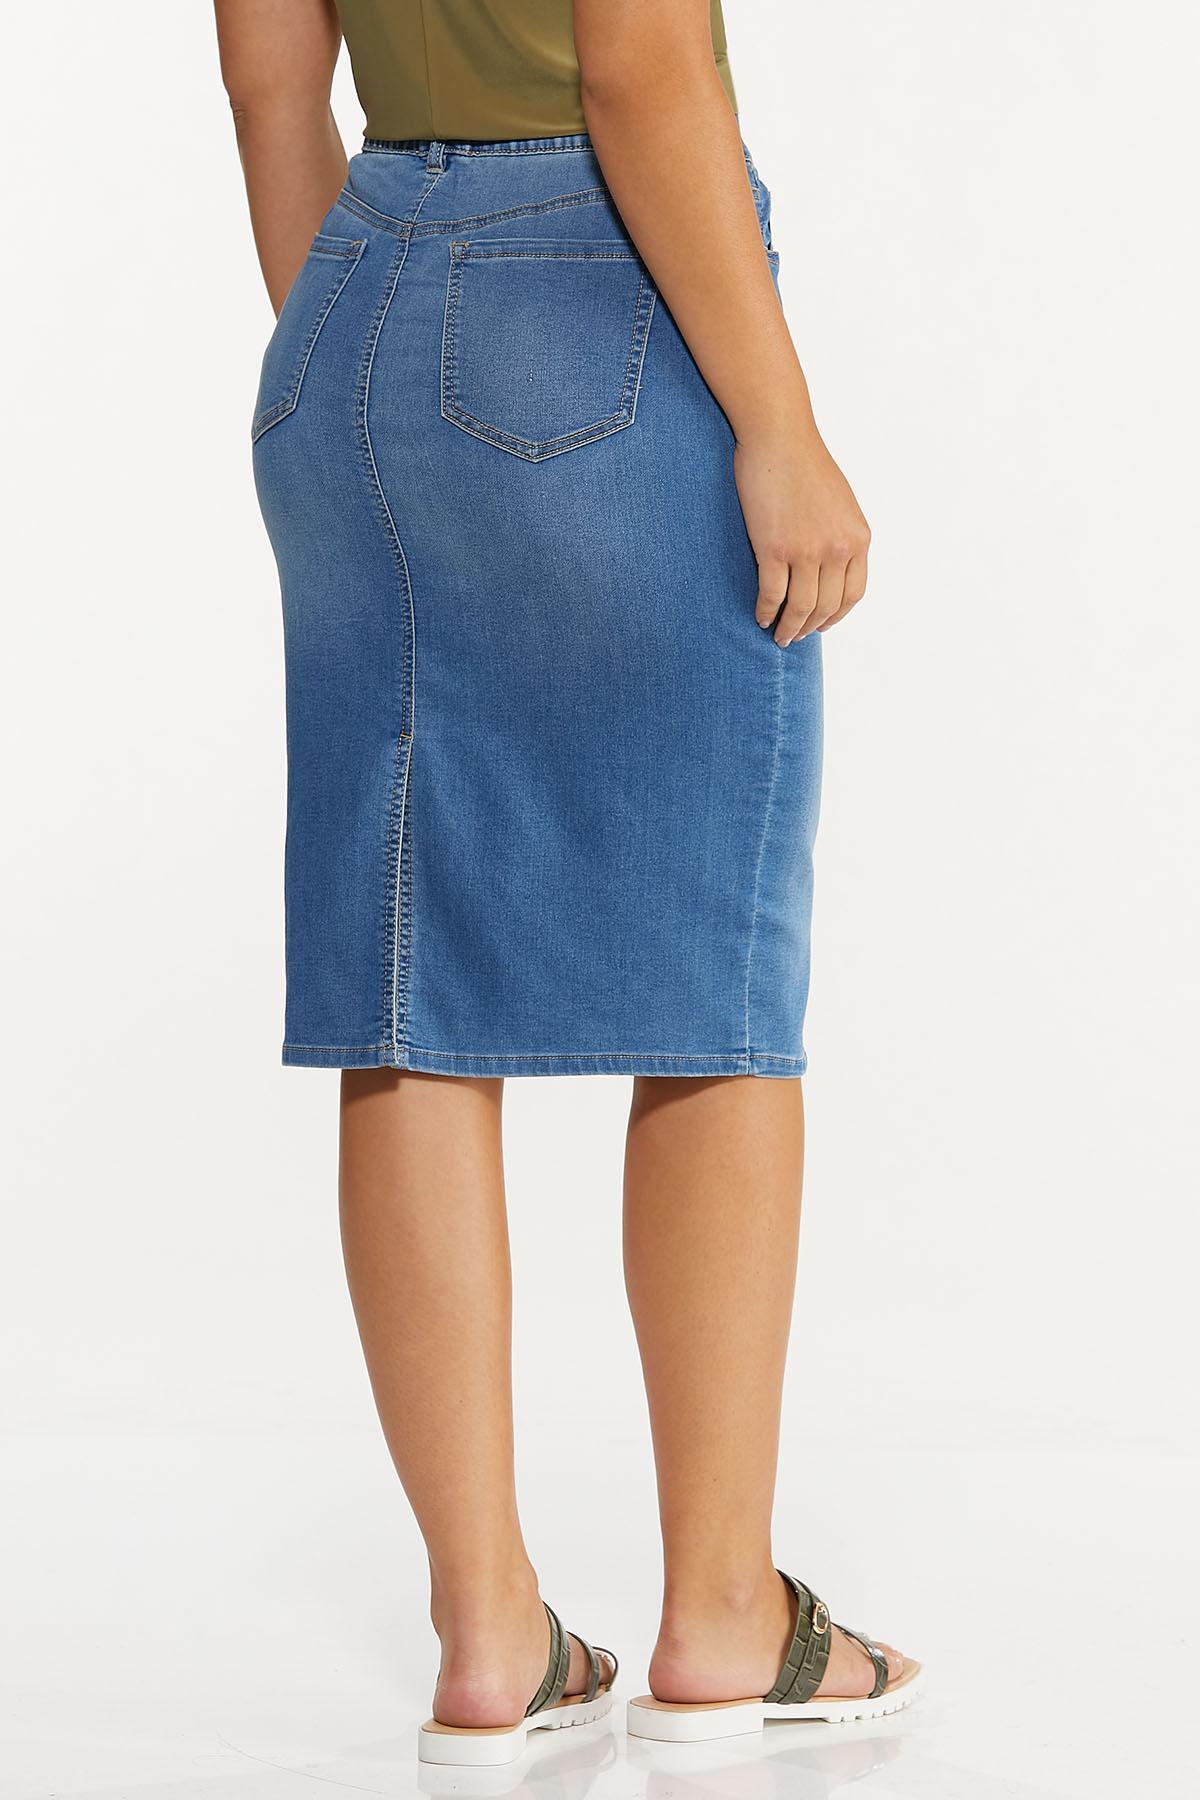 Plus Size Denim Pull-On Skirt (Item #44636574)